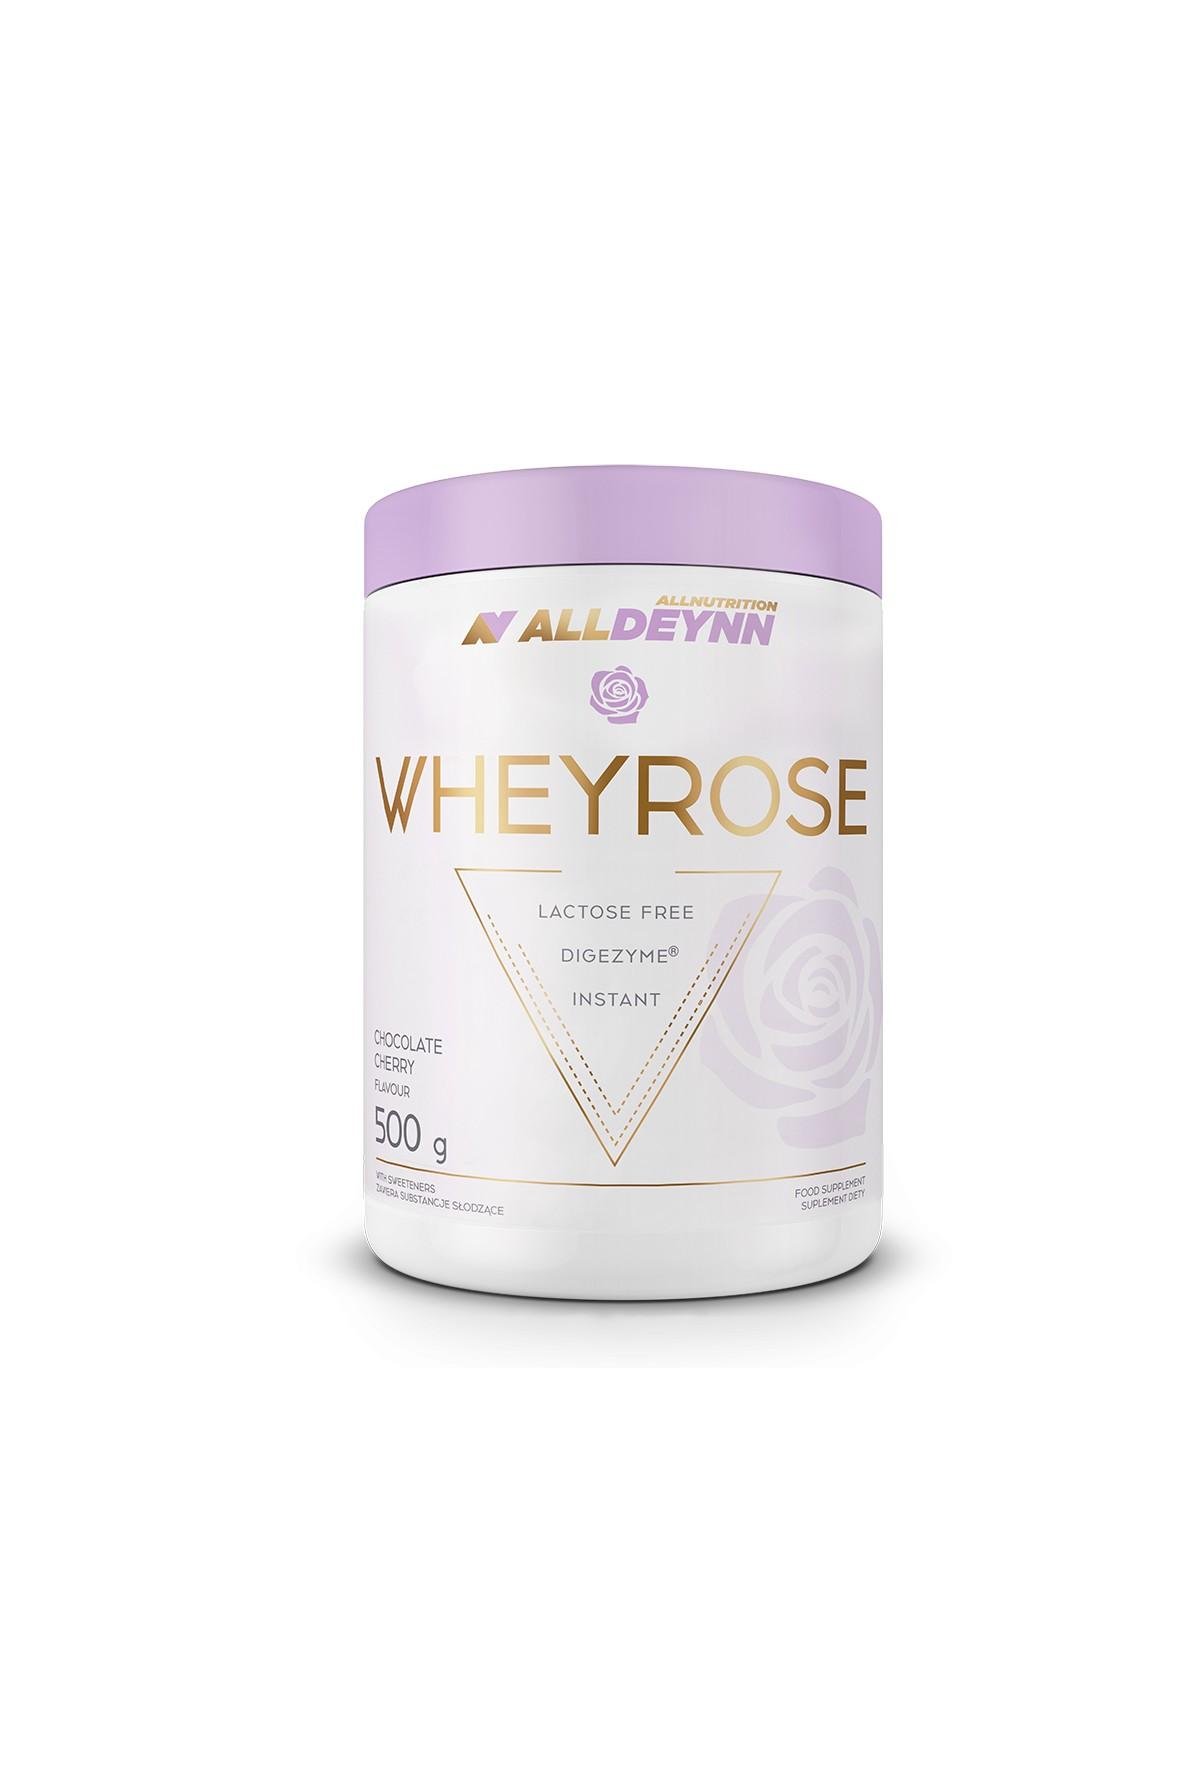 Suplementy diety - Allnutrition ALLDEYNN Wheyrose 500 g Chocolate Cherry